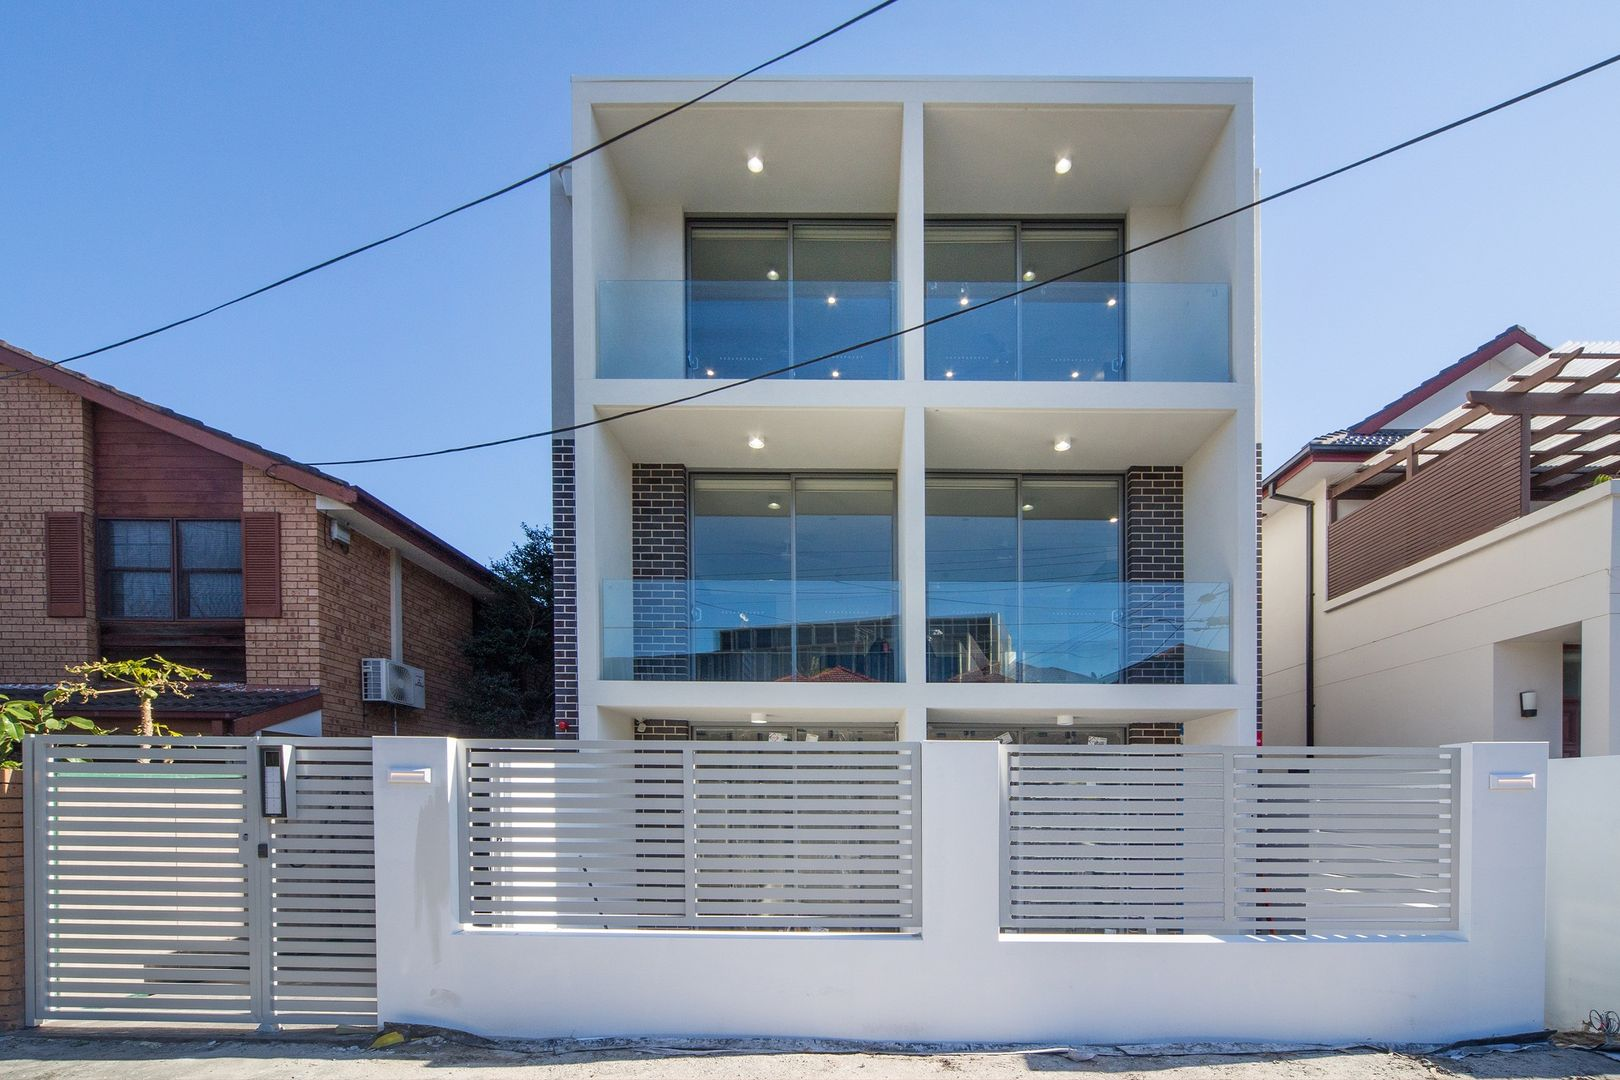 11 Houston Road, Kensington NSW 2033, Image 0